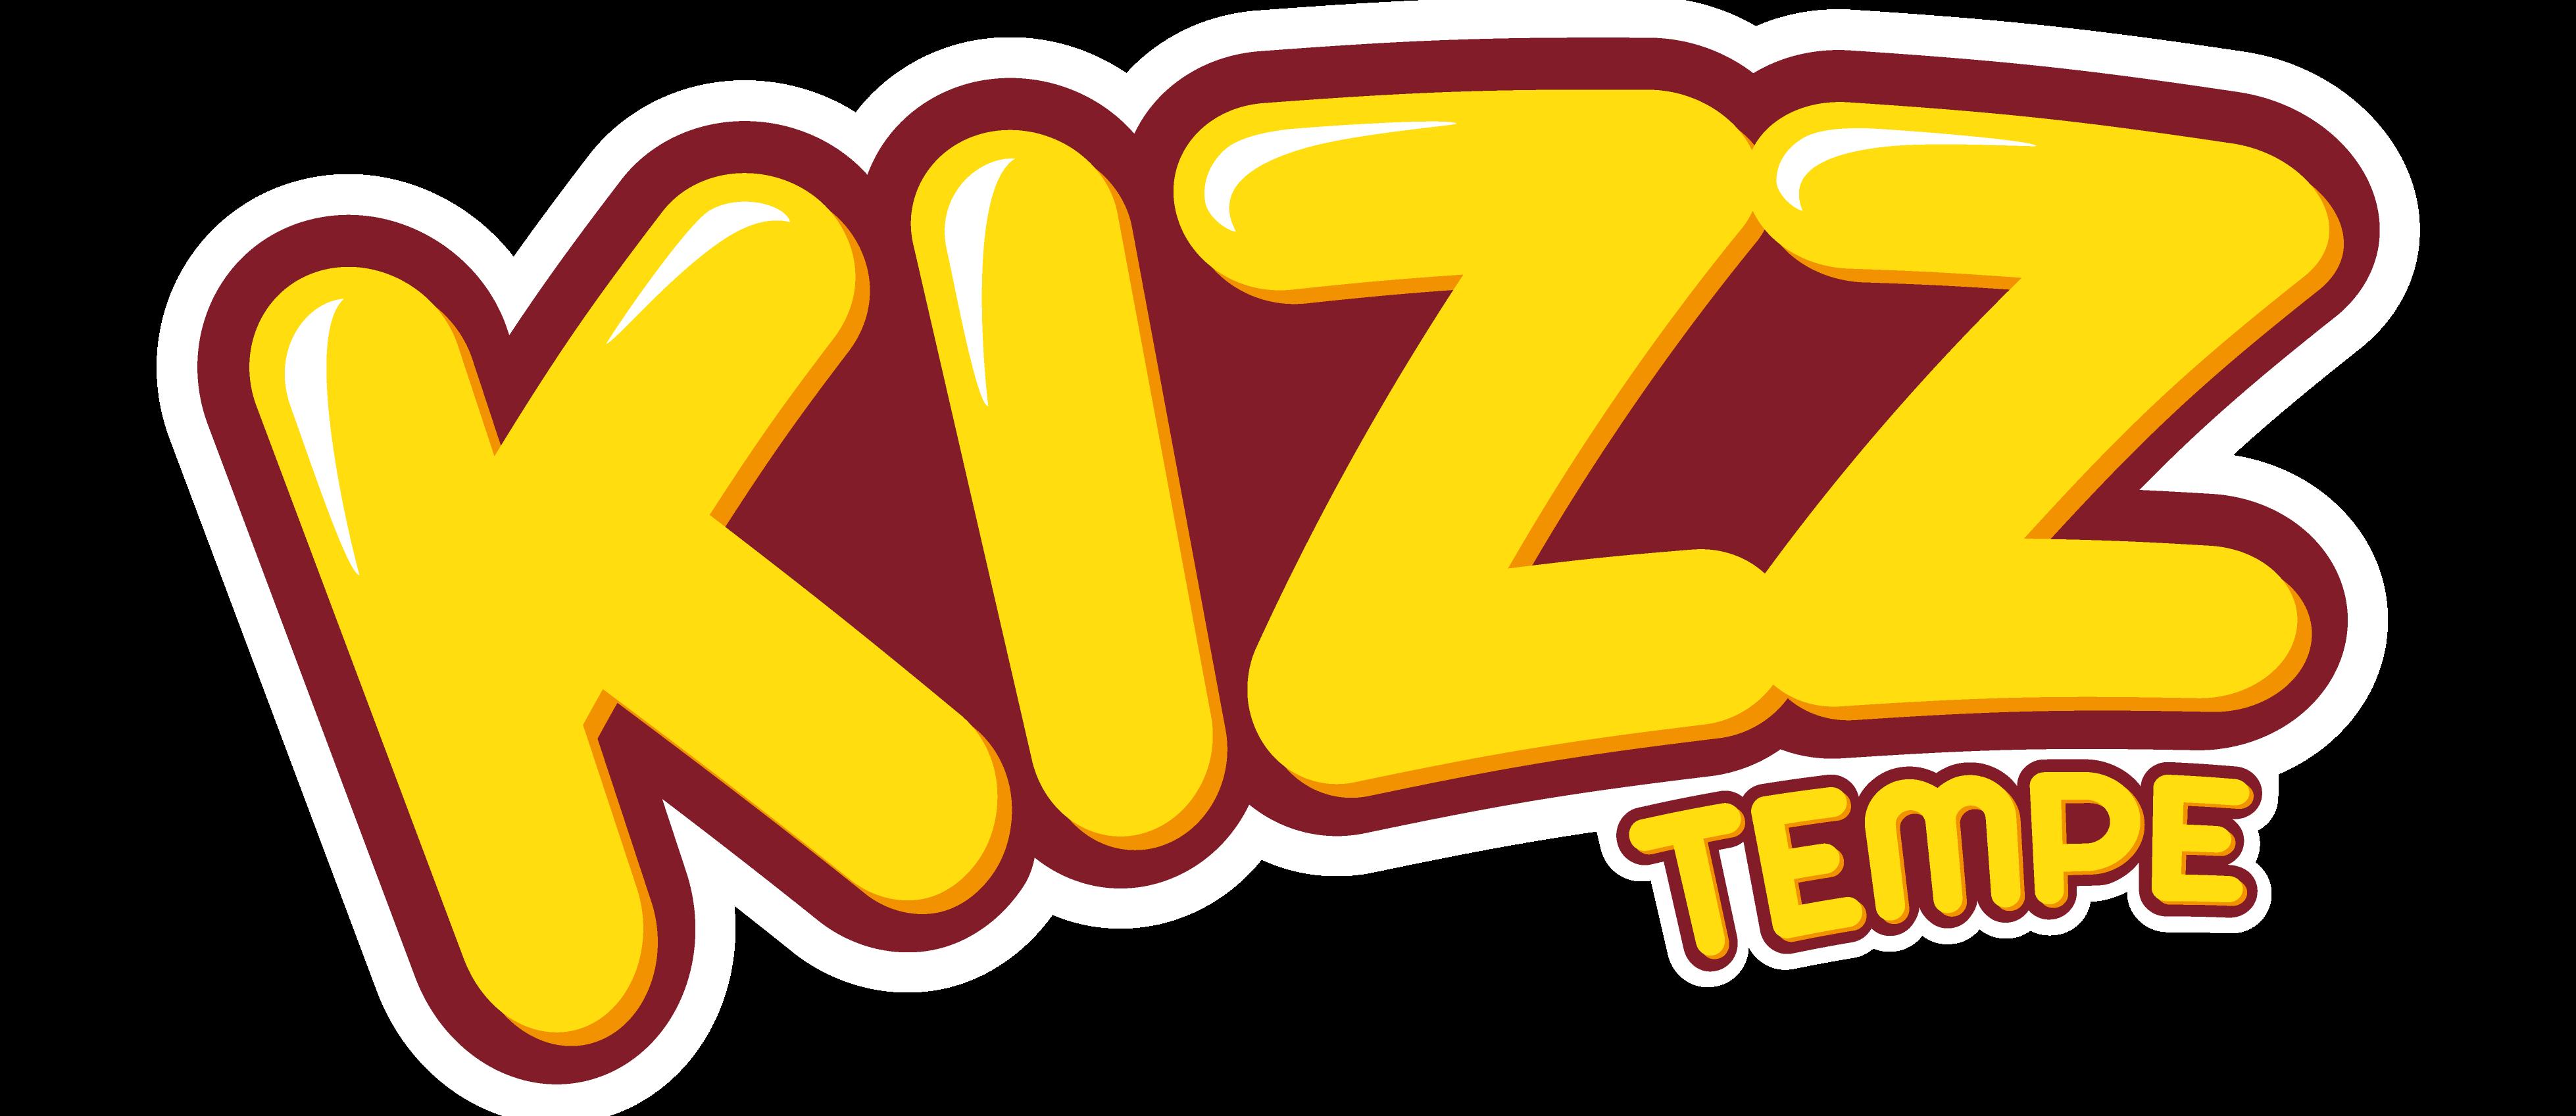 Kizz Tempe